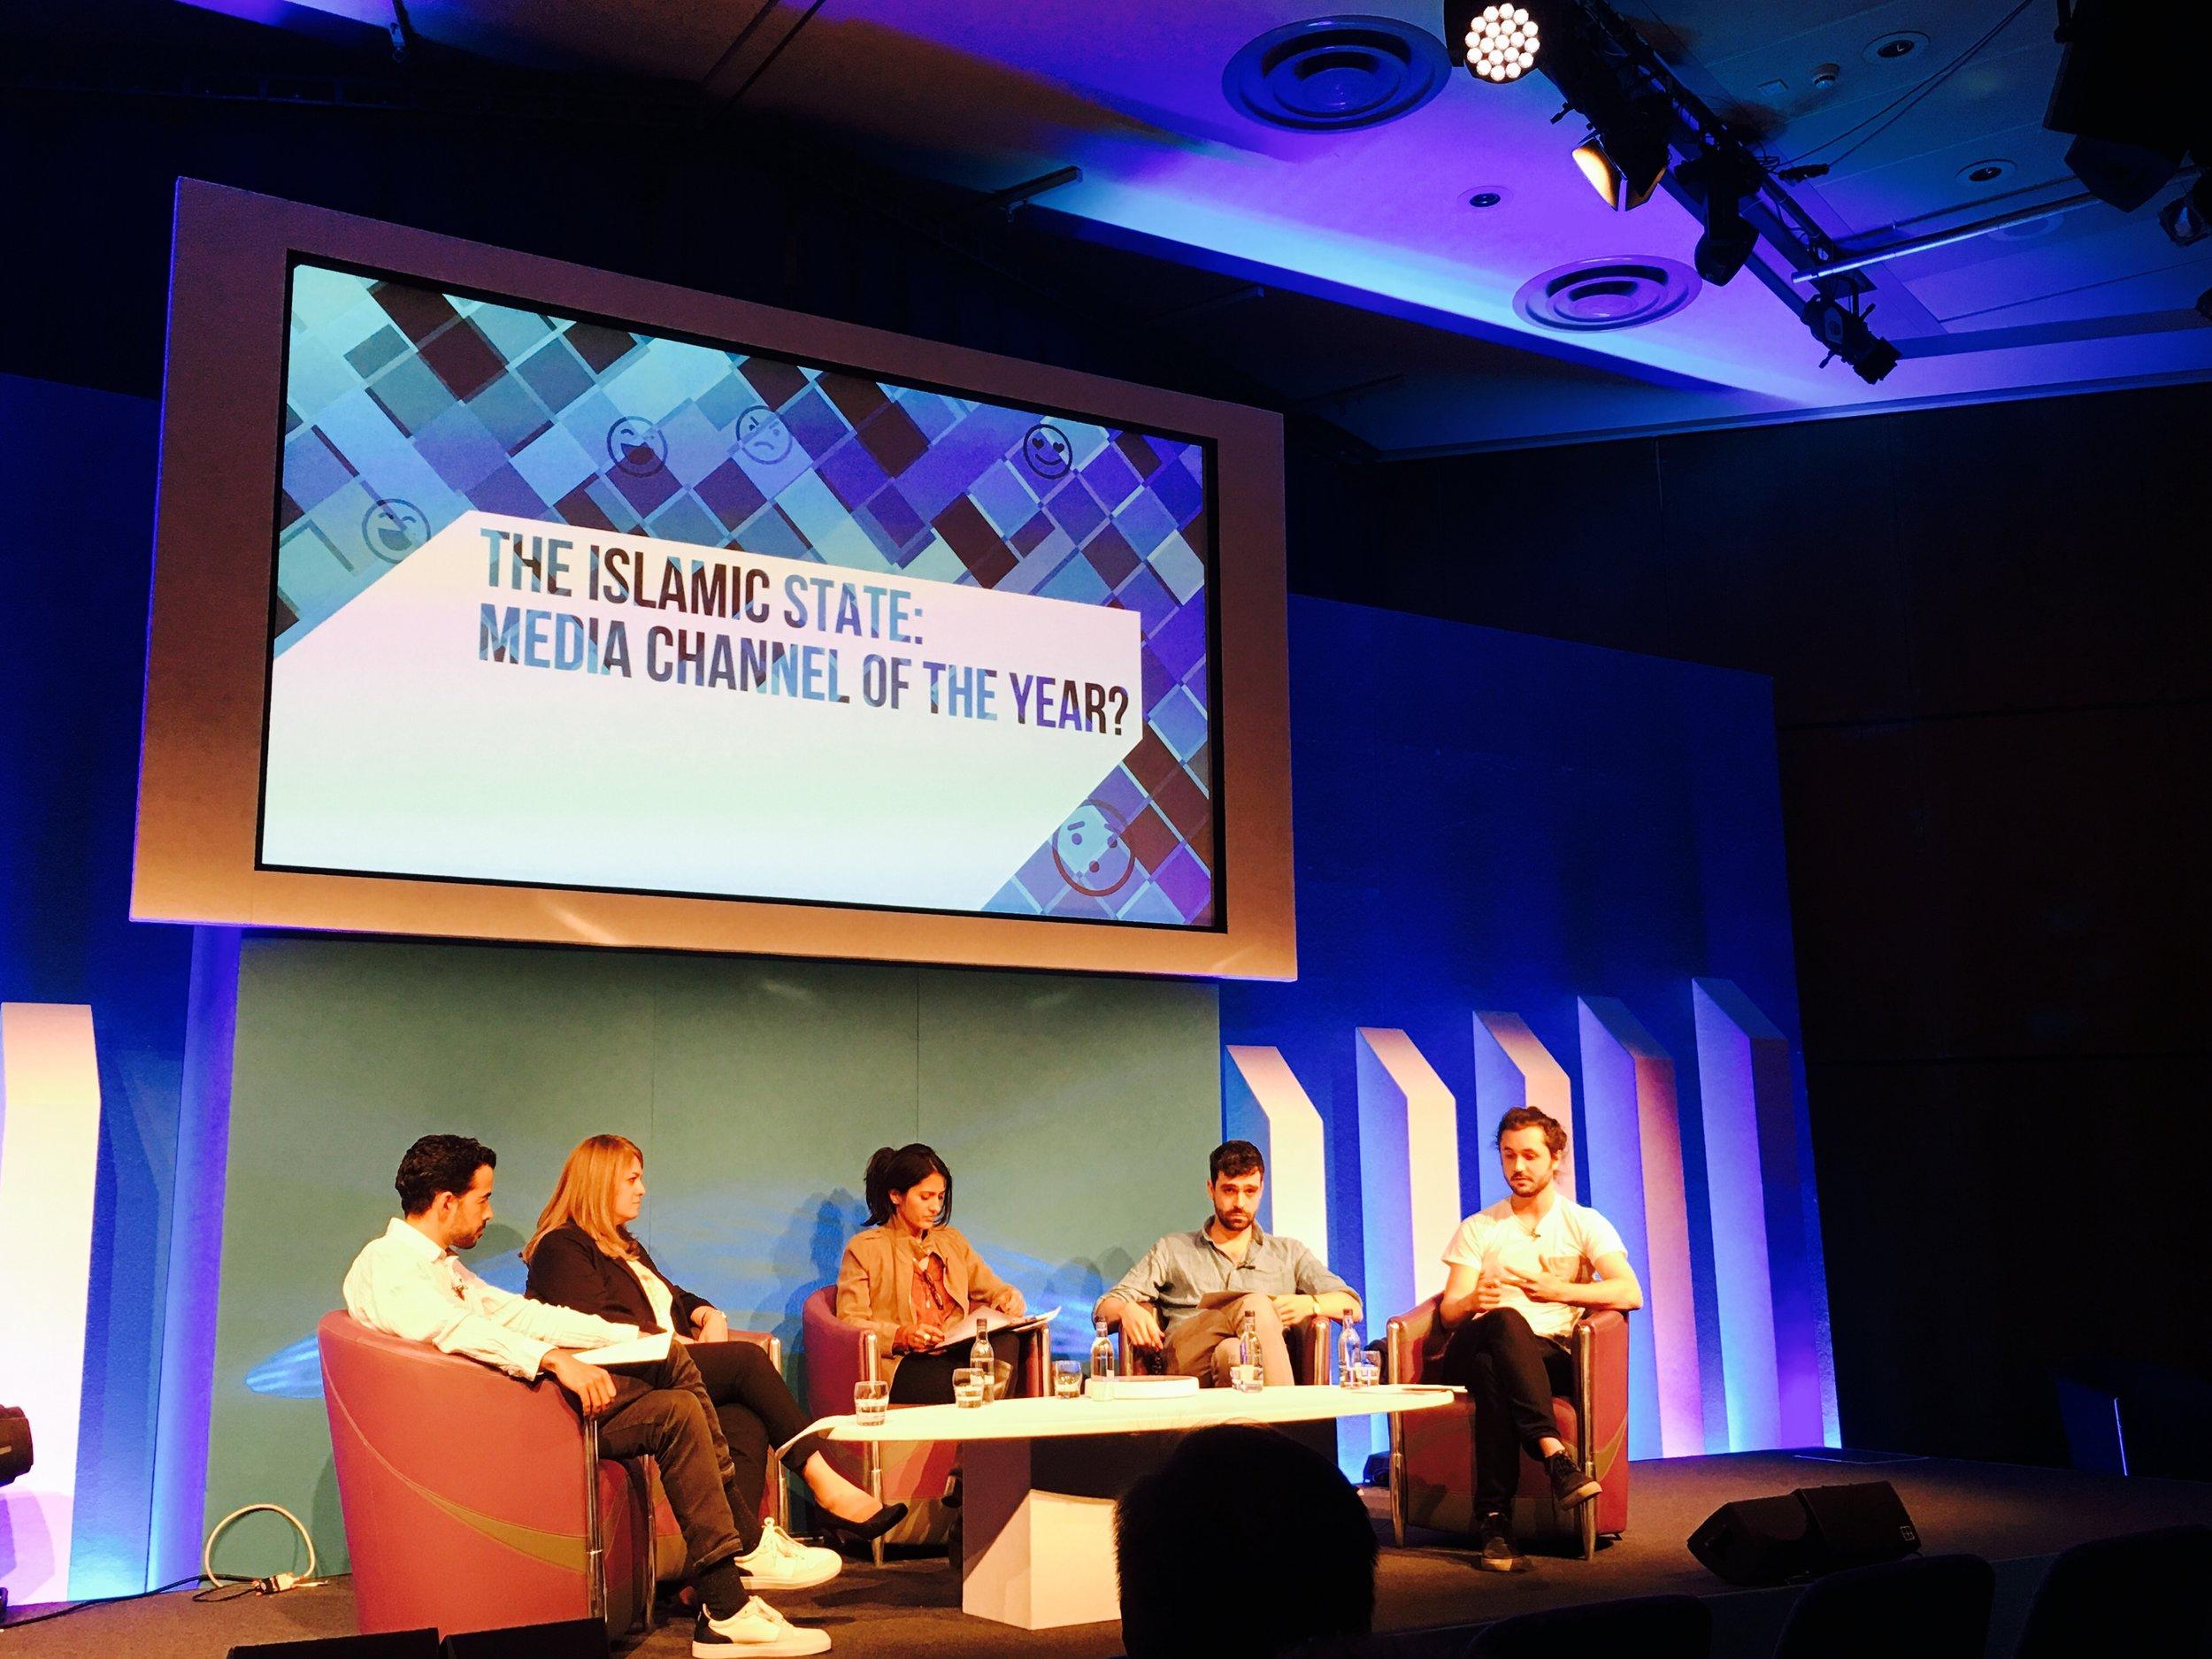 Chair of The Islamic State panel - Edinburgh International TV festival 2016